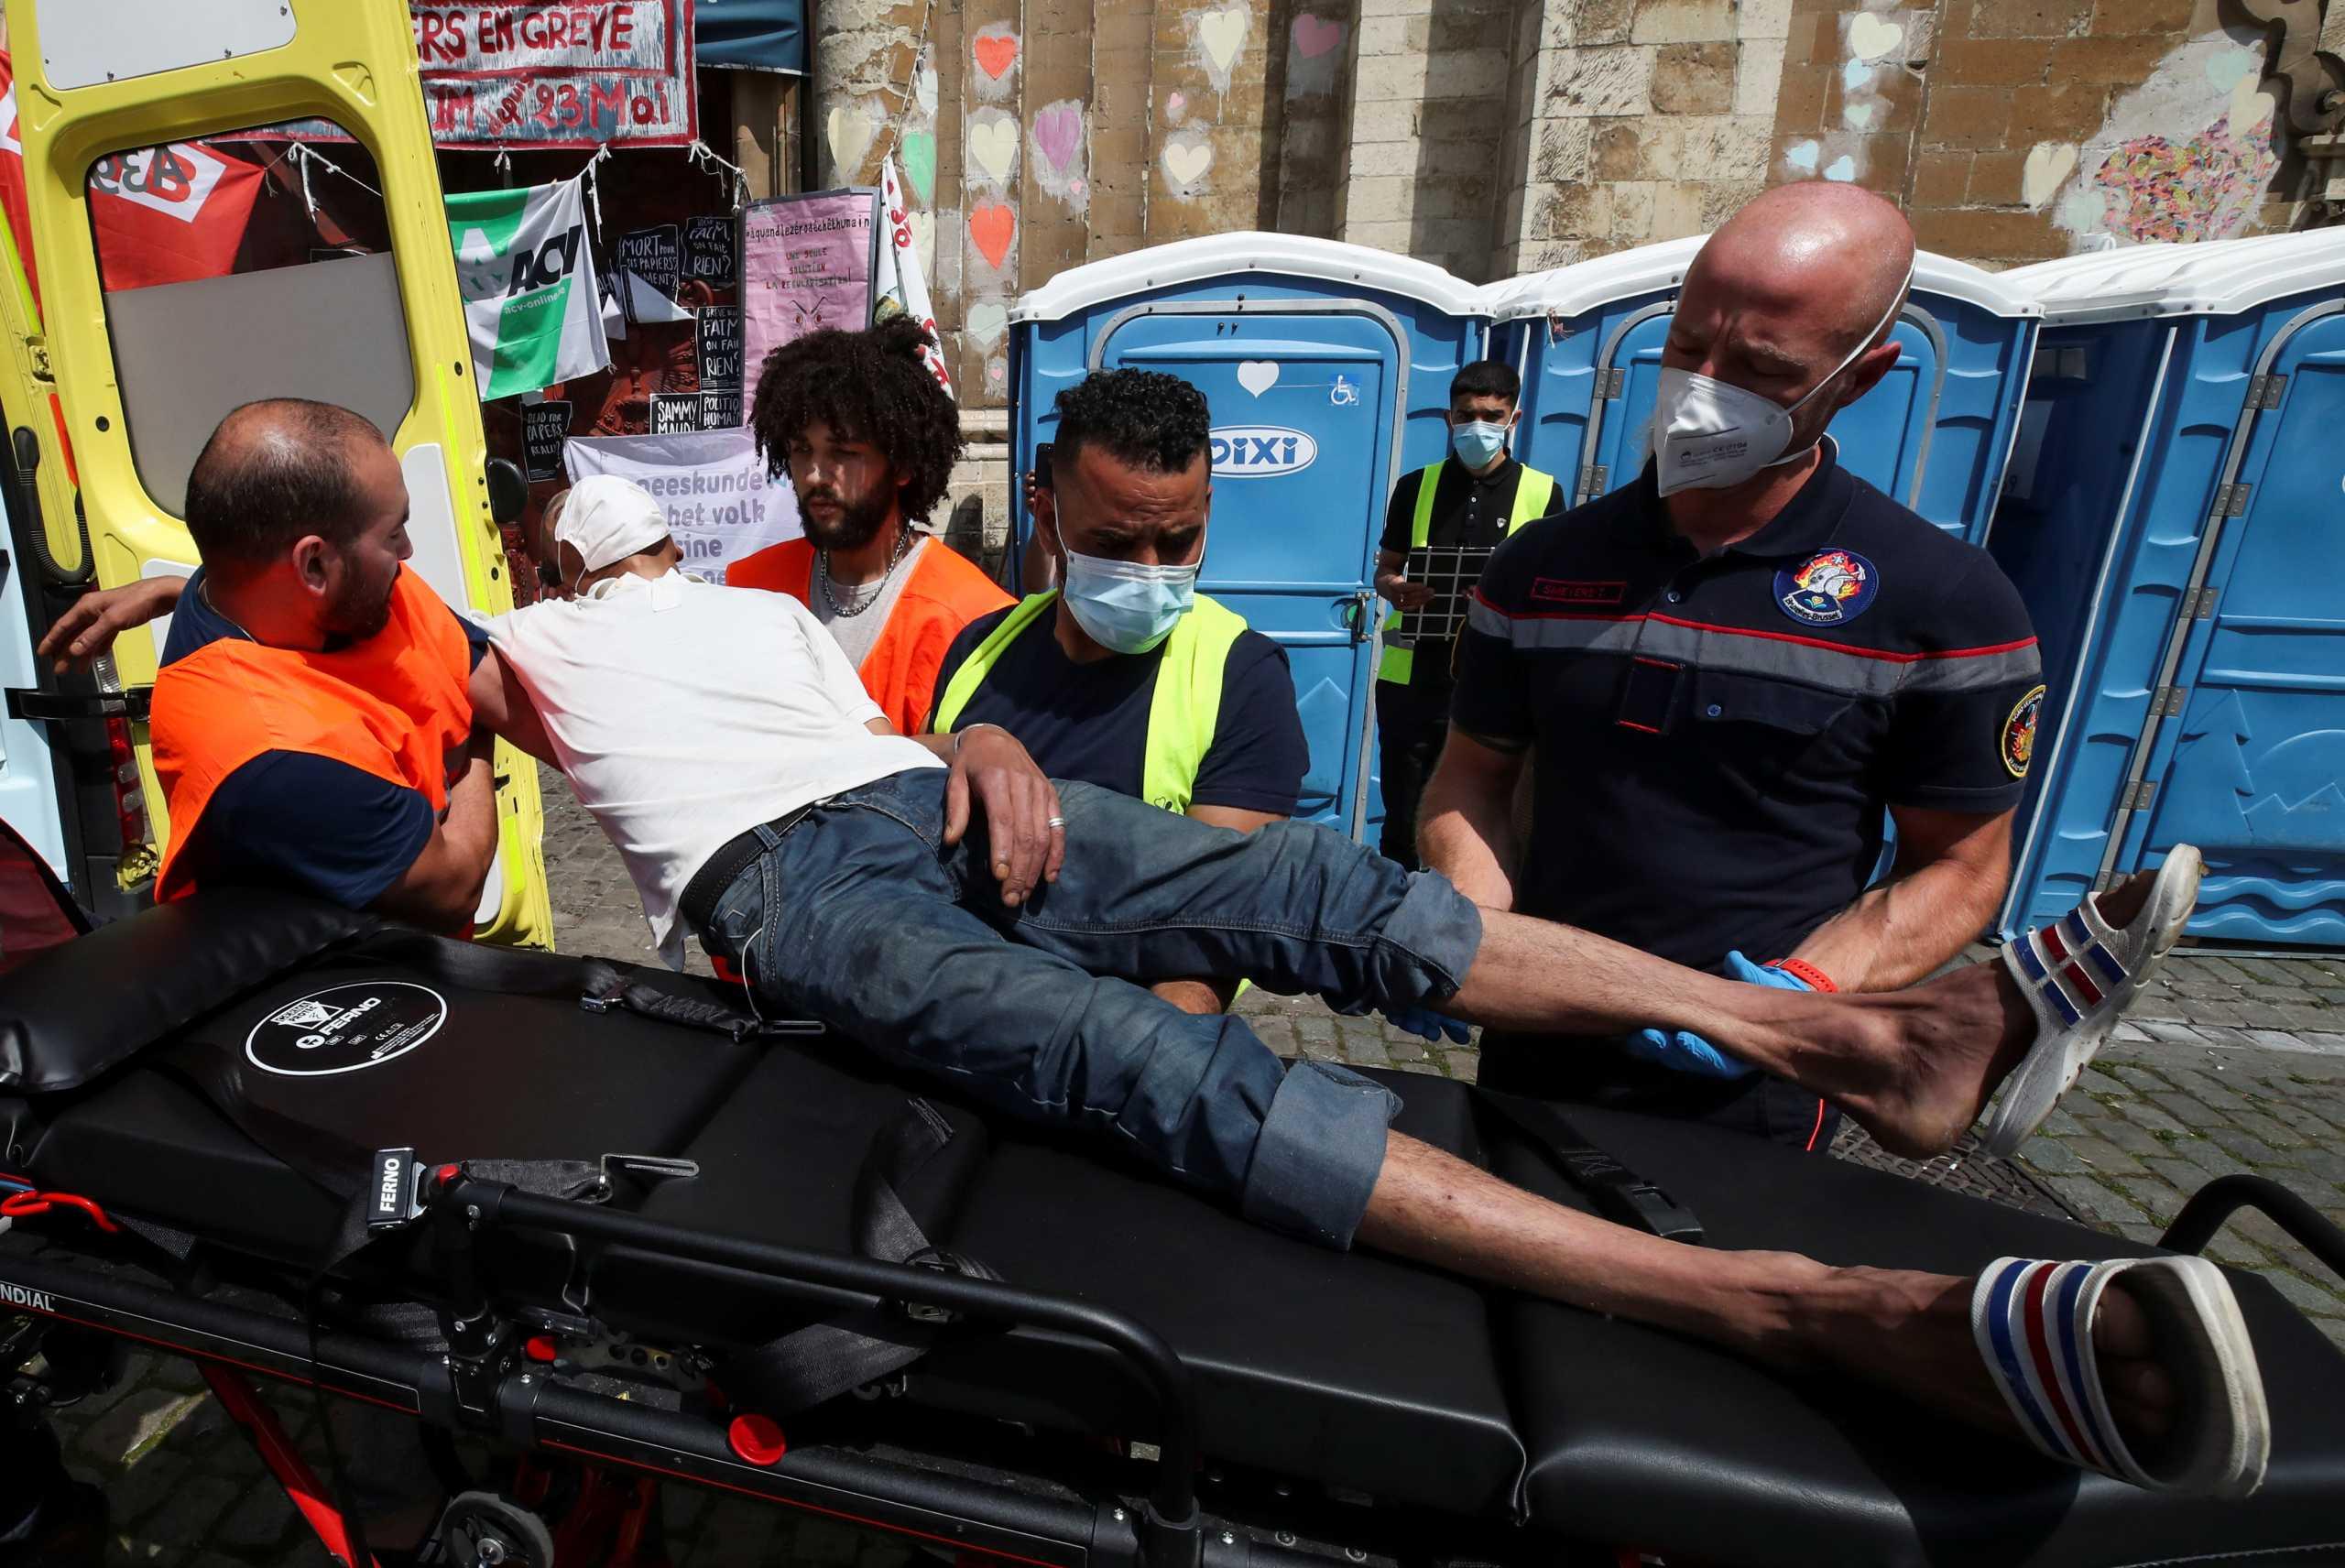 Bέλγιο: Σταμάτησαν μετά δύο μήνες την απεργία πείνας οι 450 παράτυποι μετανάστες στις Βρυξέλλες